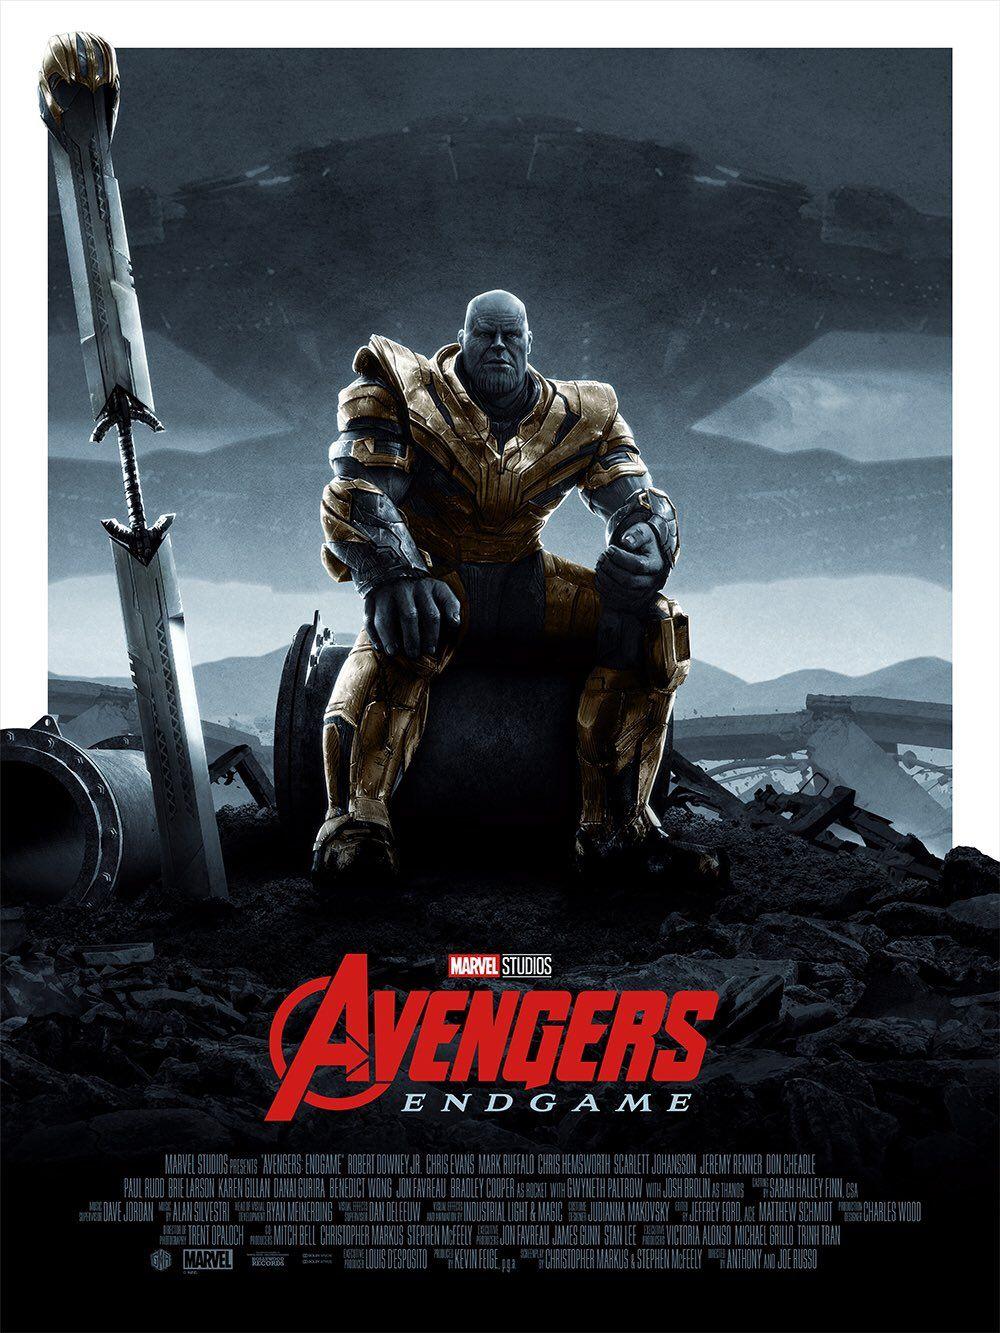 AVENGERS ENDGAME Thanos Is Inevitable On This Amazing